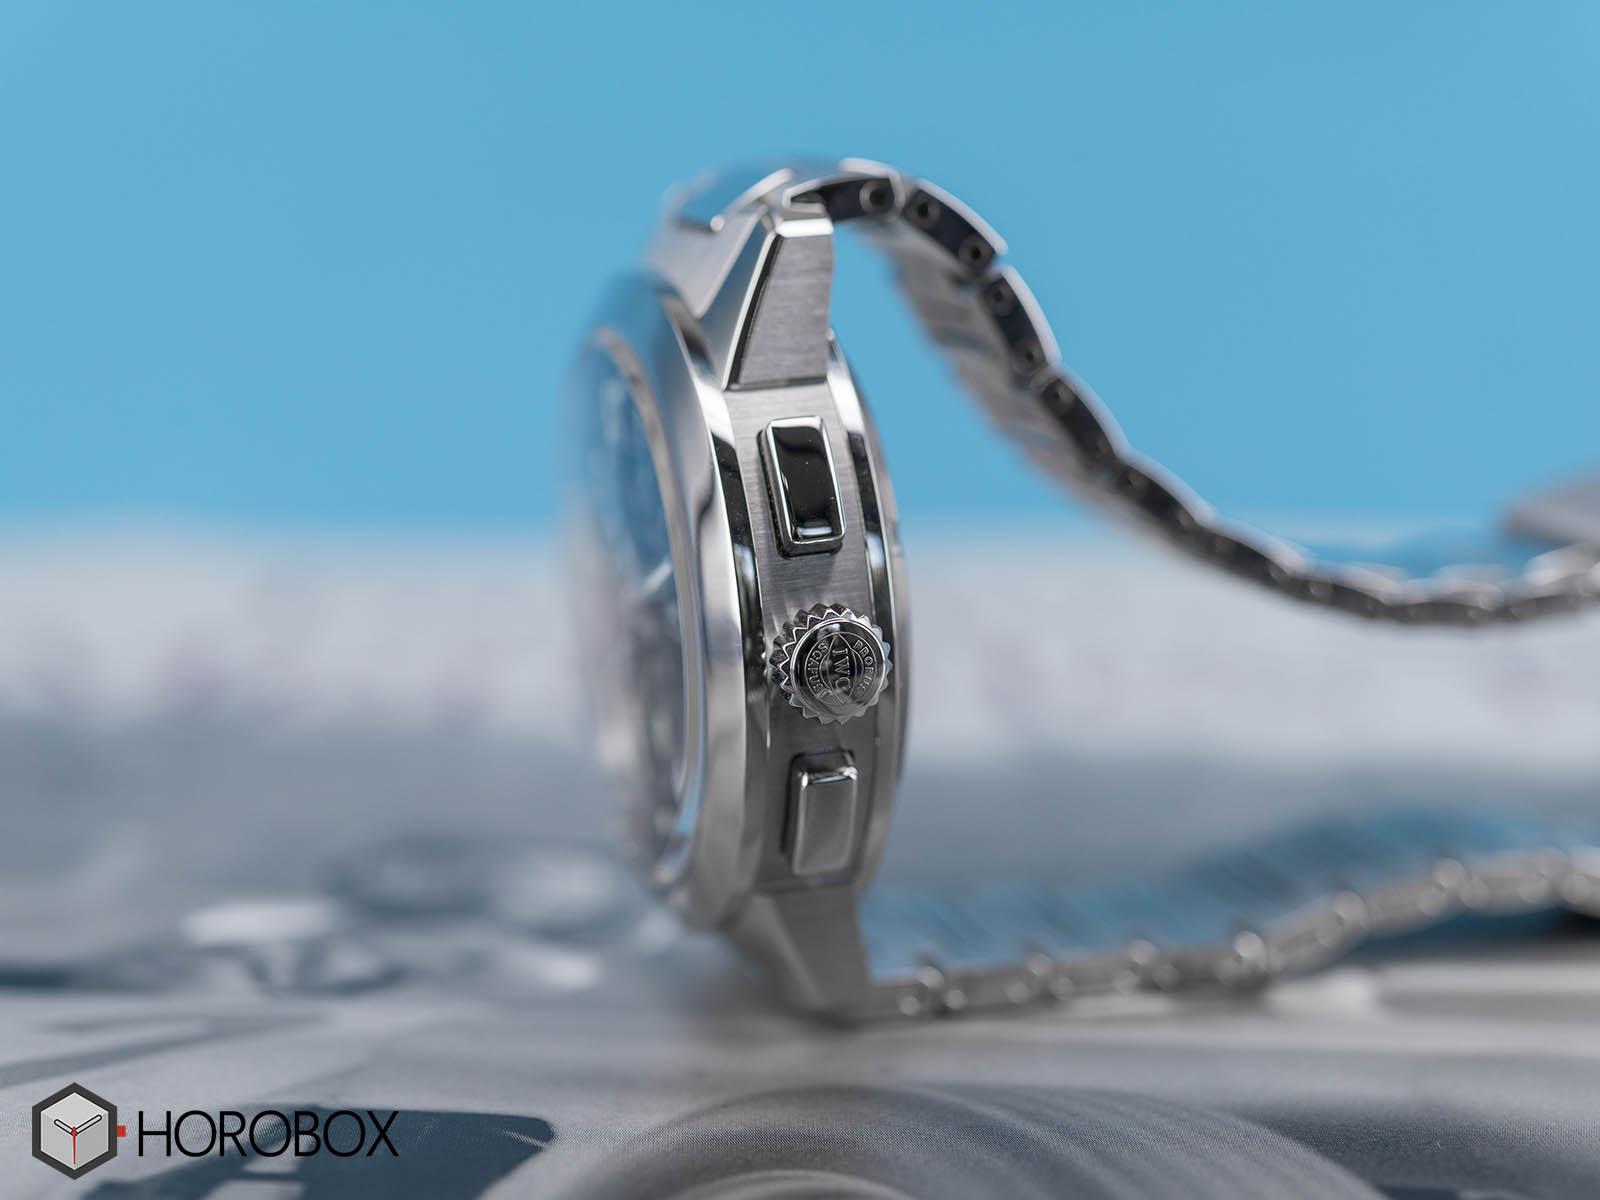 iwc-ingenieur-chronograph-W380802-5-.jpg